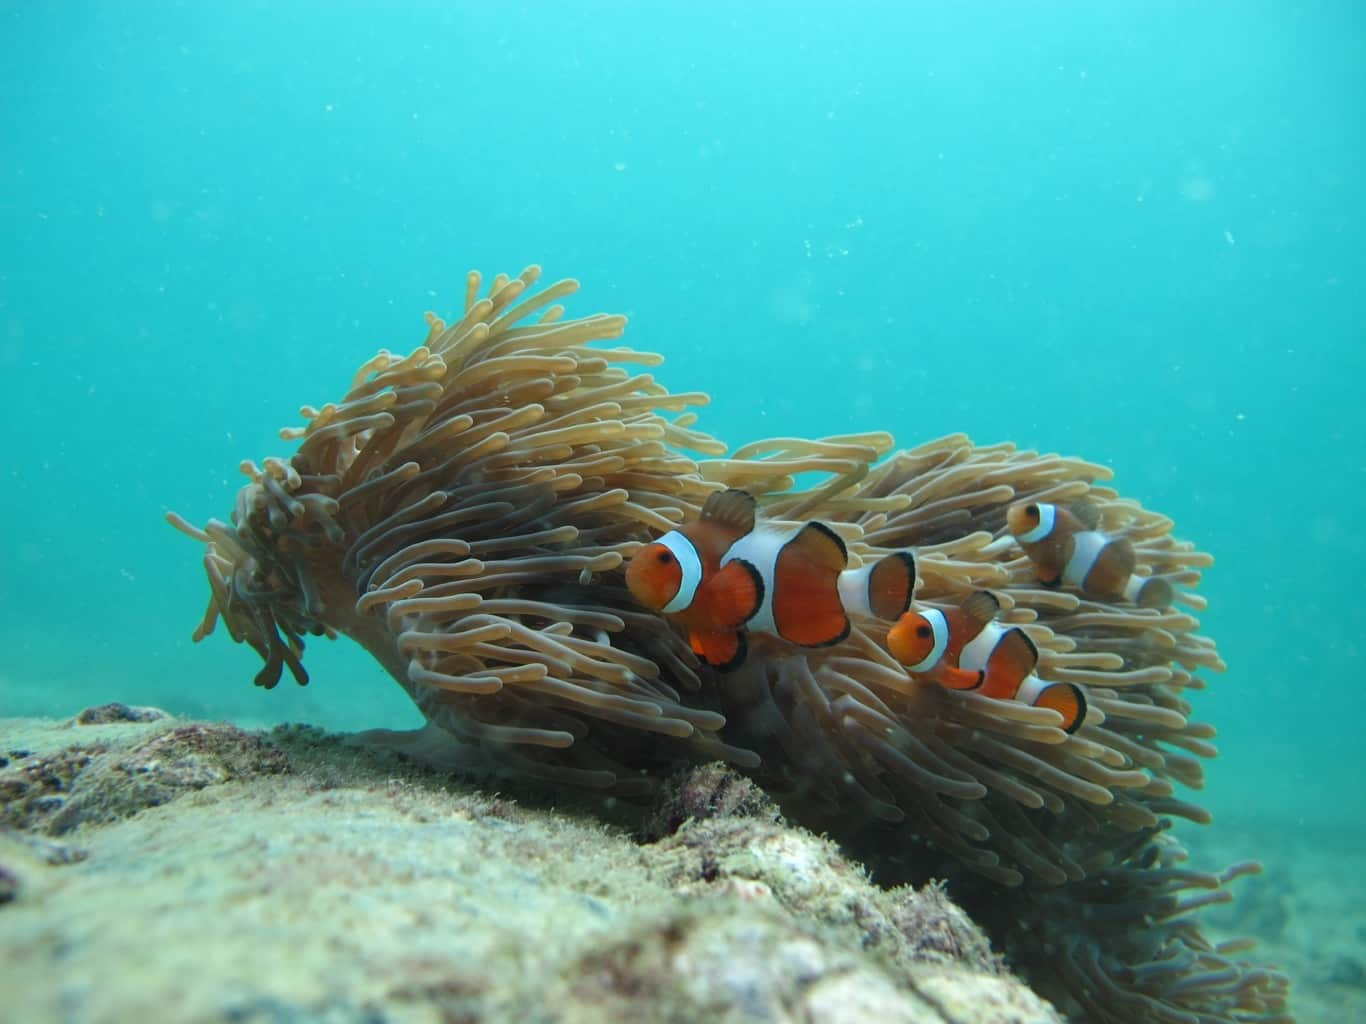 Séjour en couple à Ao Nang Les îles de Krabi Koh Phi Phi Nemo snorkeling